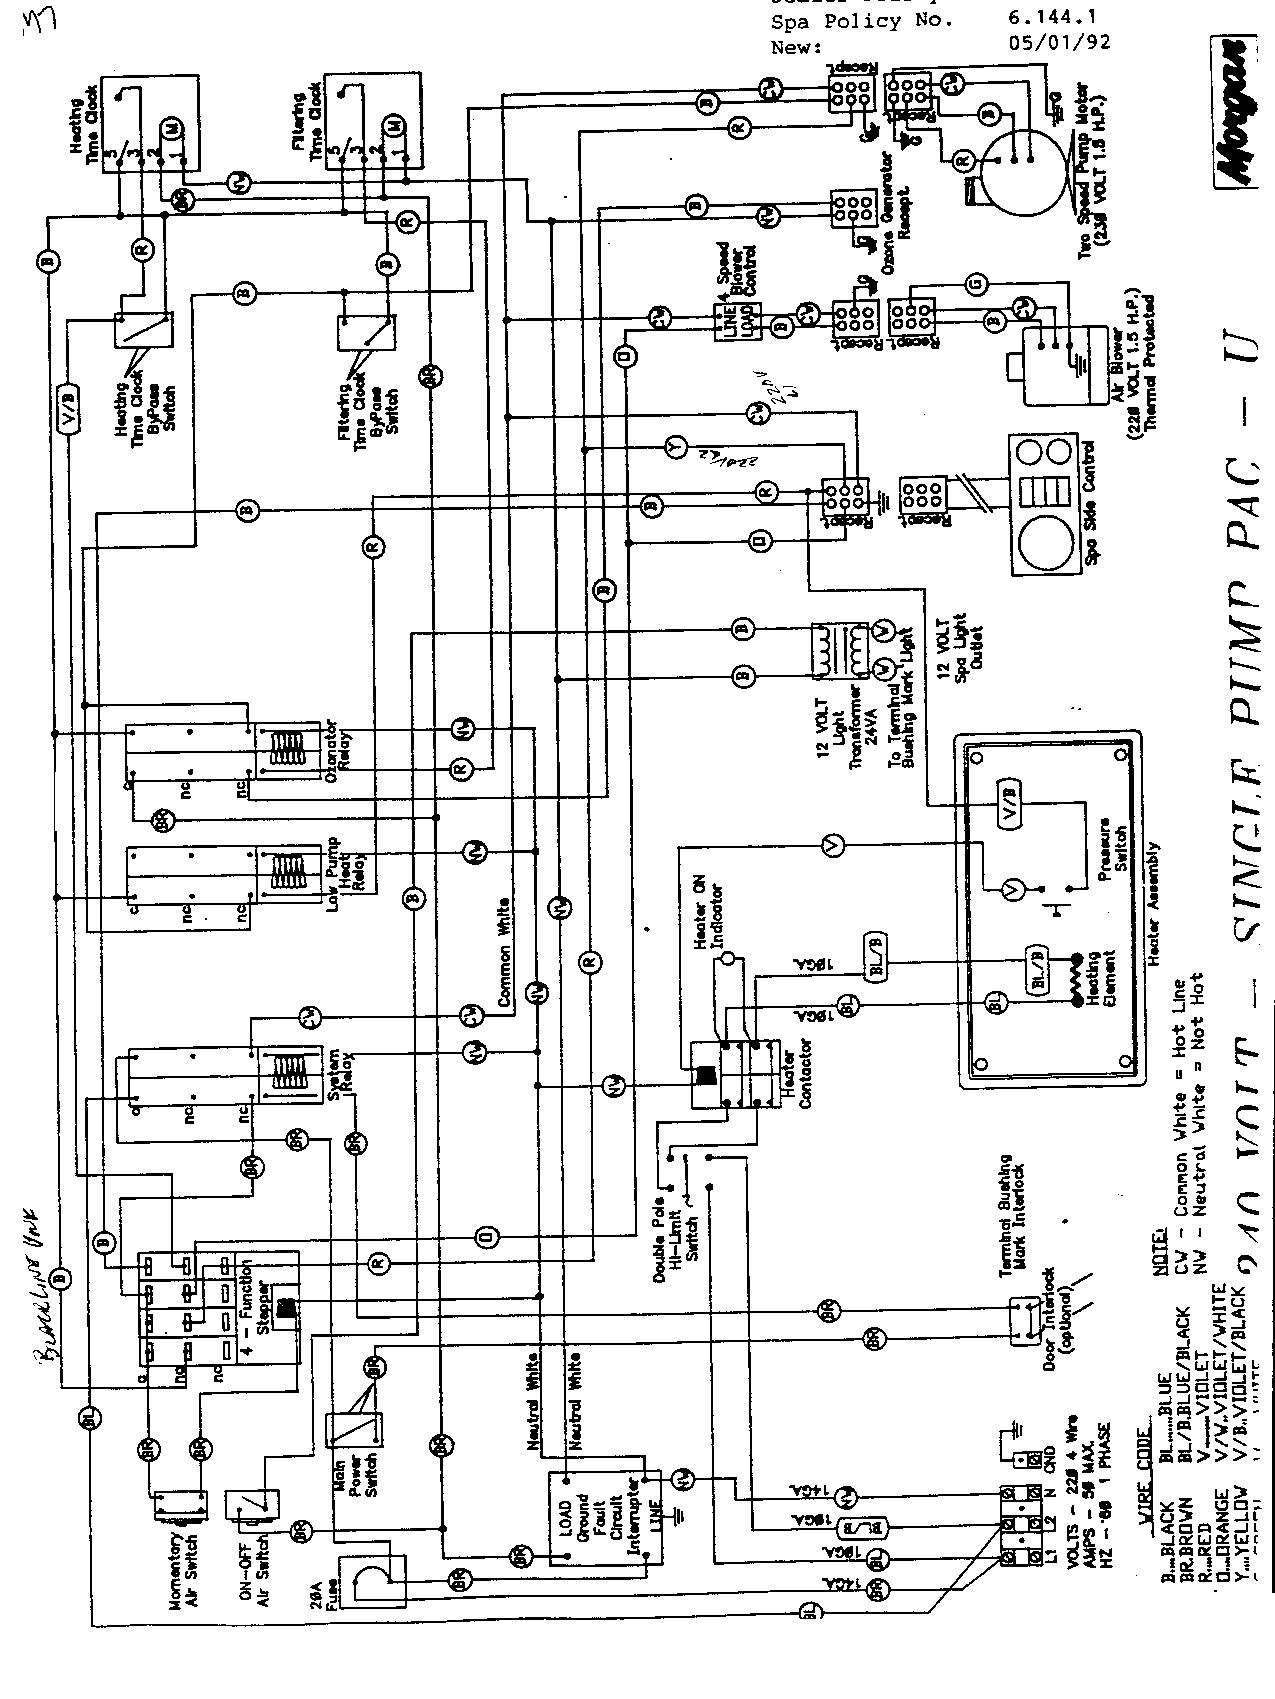 morgan hot tub wiring diagram